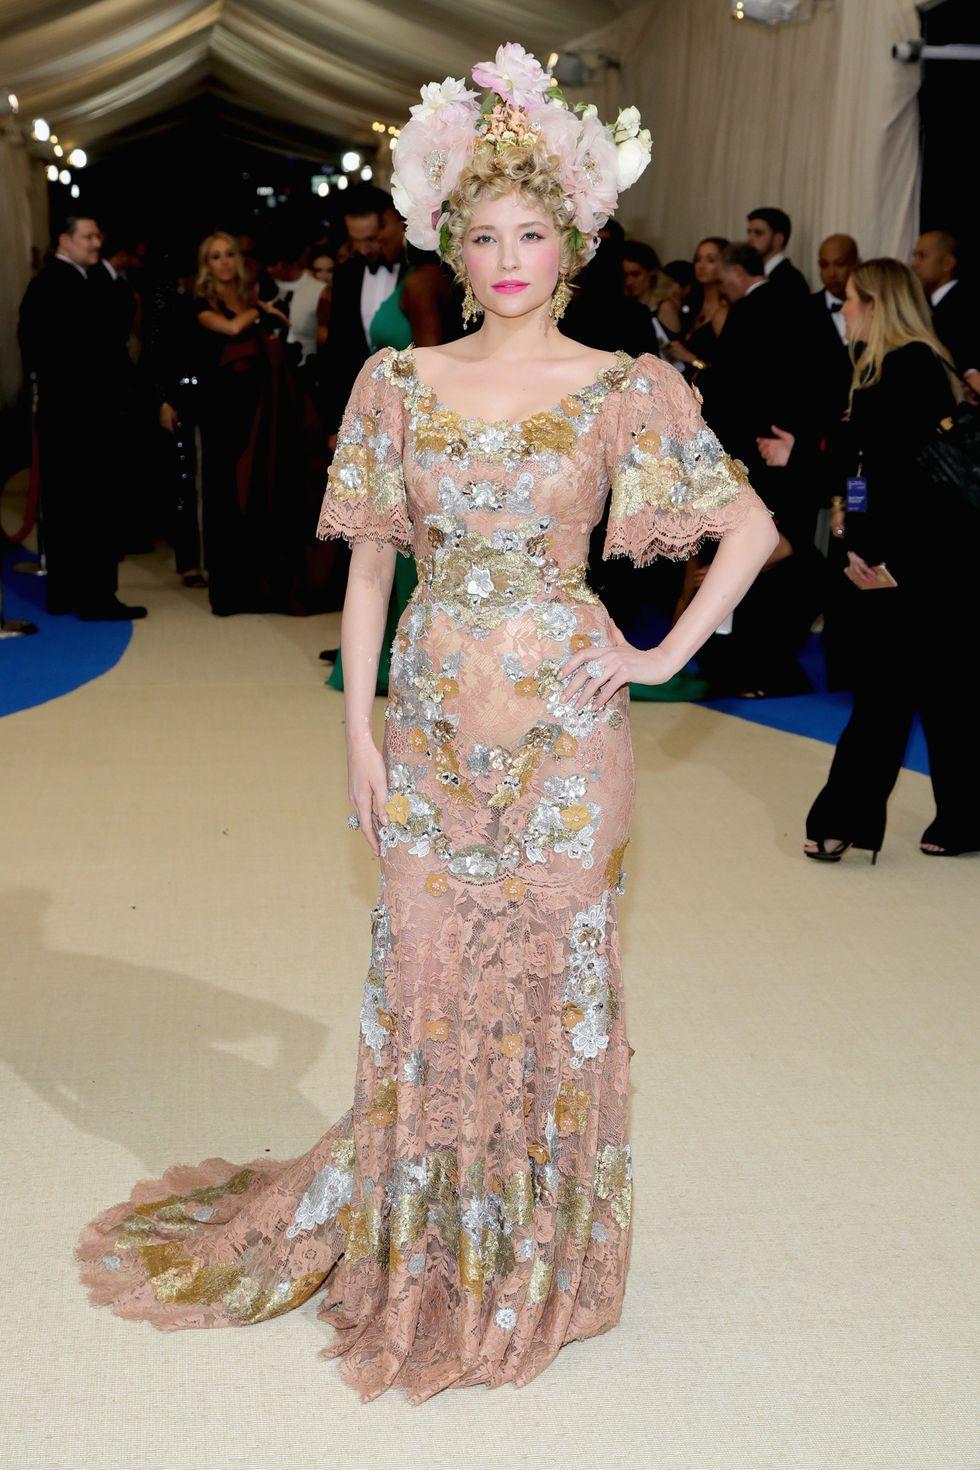 Dolce & Gabbana haley-bennett-1493687571.jpg